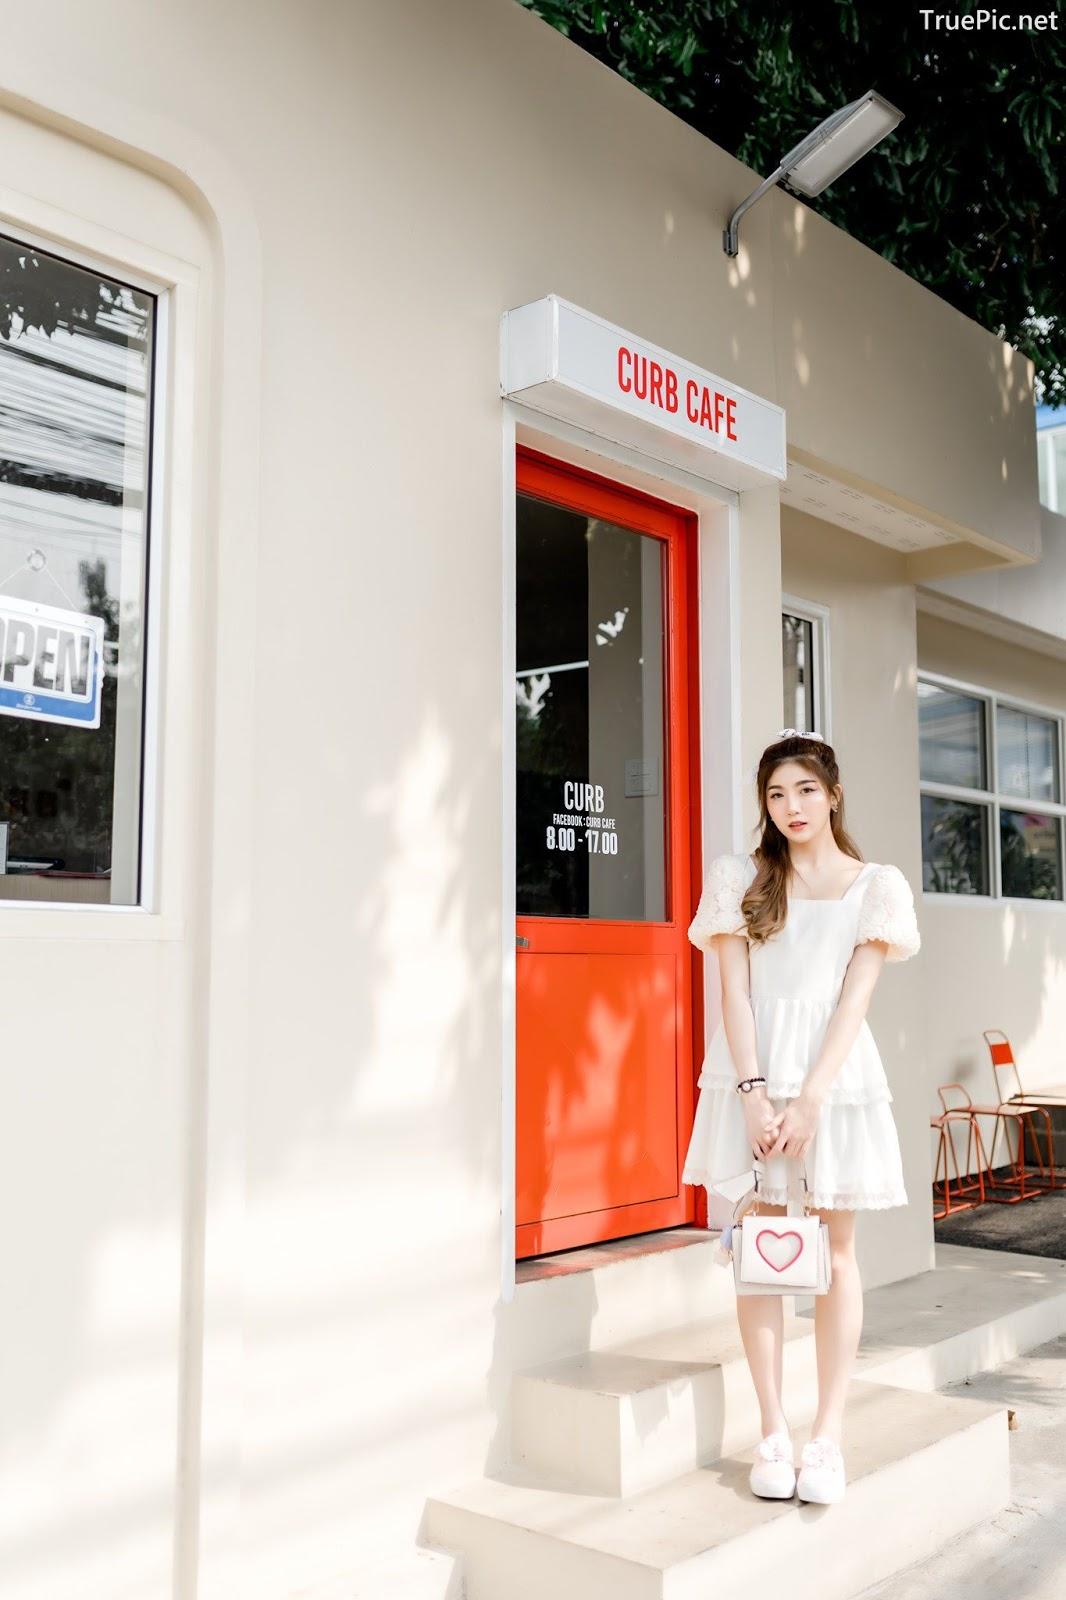 Image Thailand Model - Sasi Ngiunwan - Barbie Doll Smile - TruePic.net - Picture-5